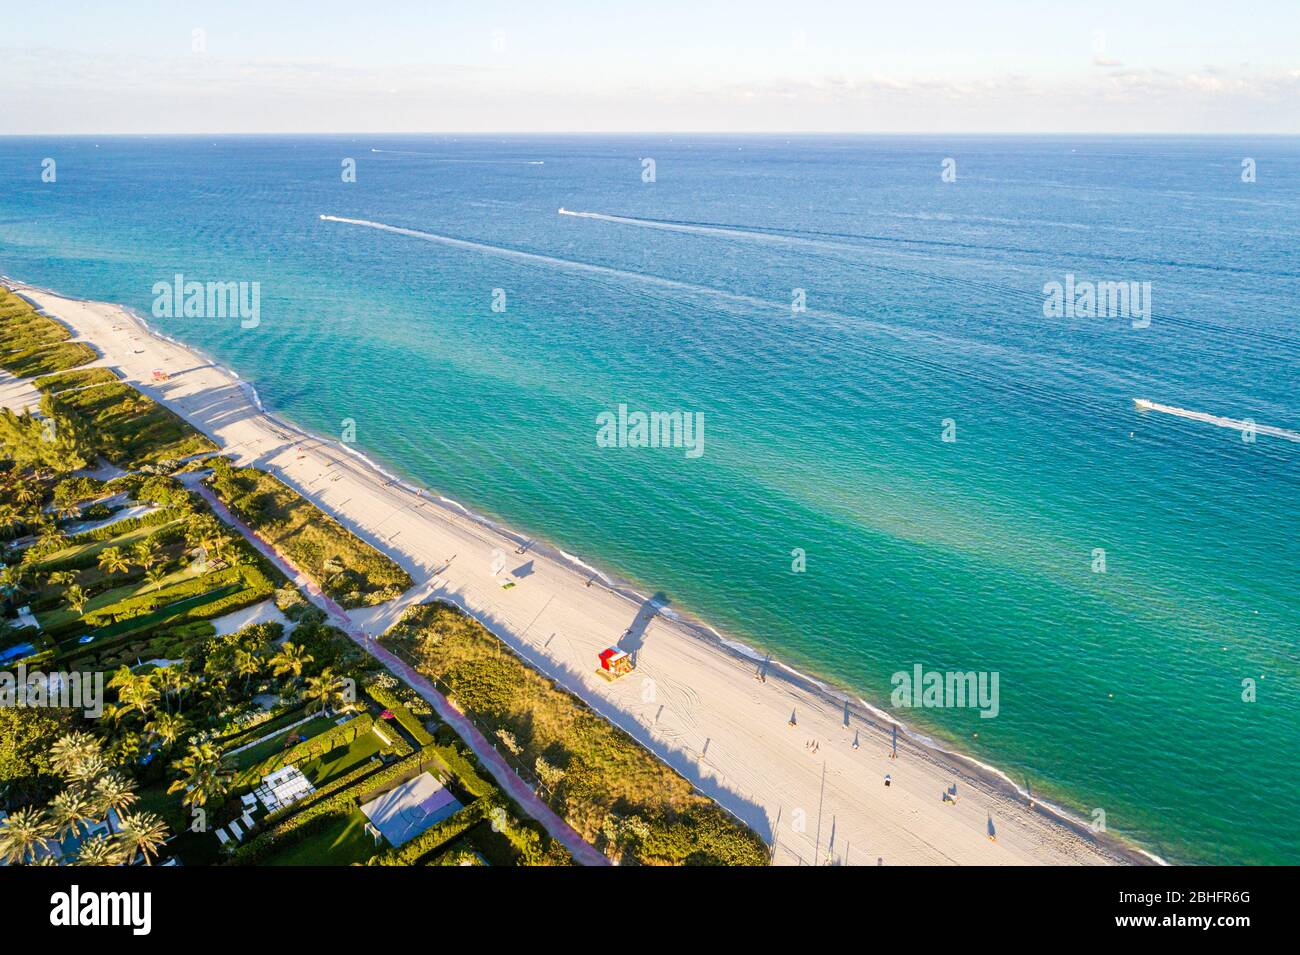 Florida Miami Beach Océano Atlántico público aérea vista aérea Vista sobre North Beach surf de arena Foto de stock